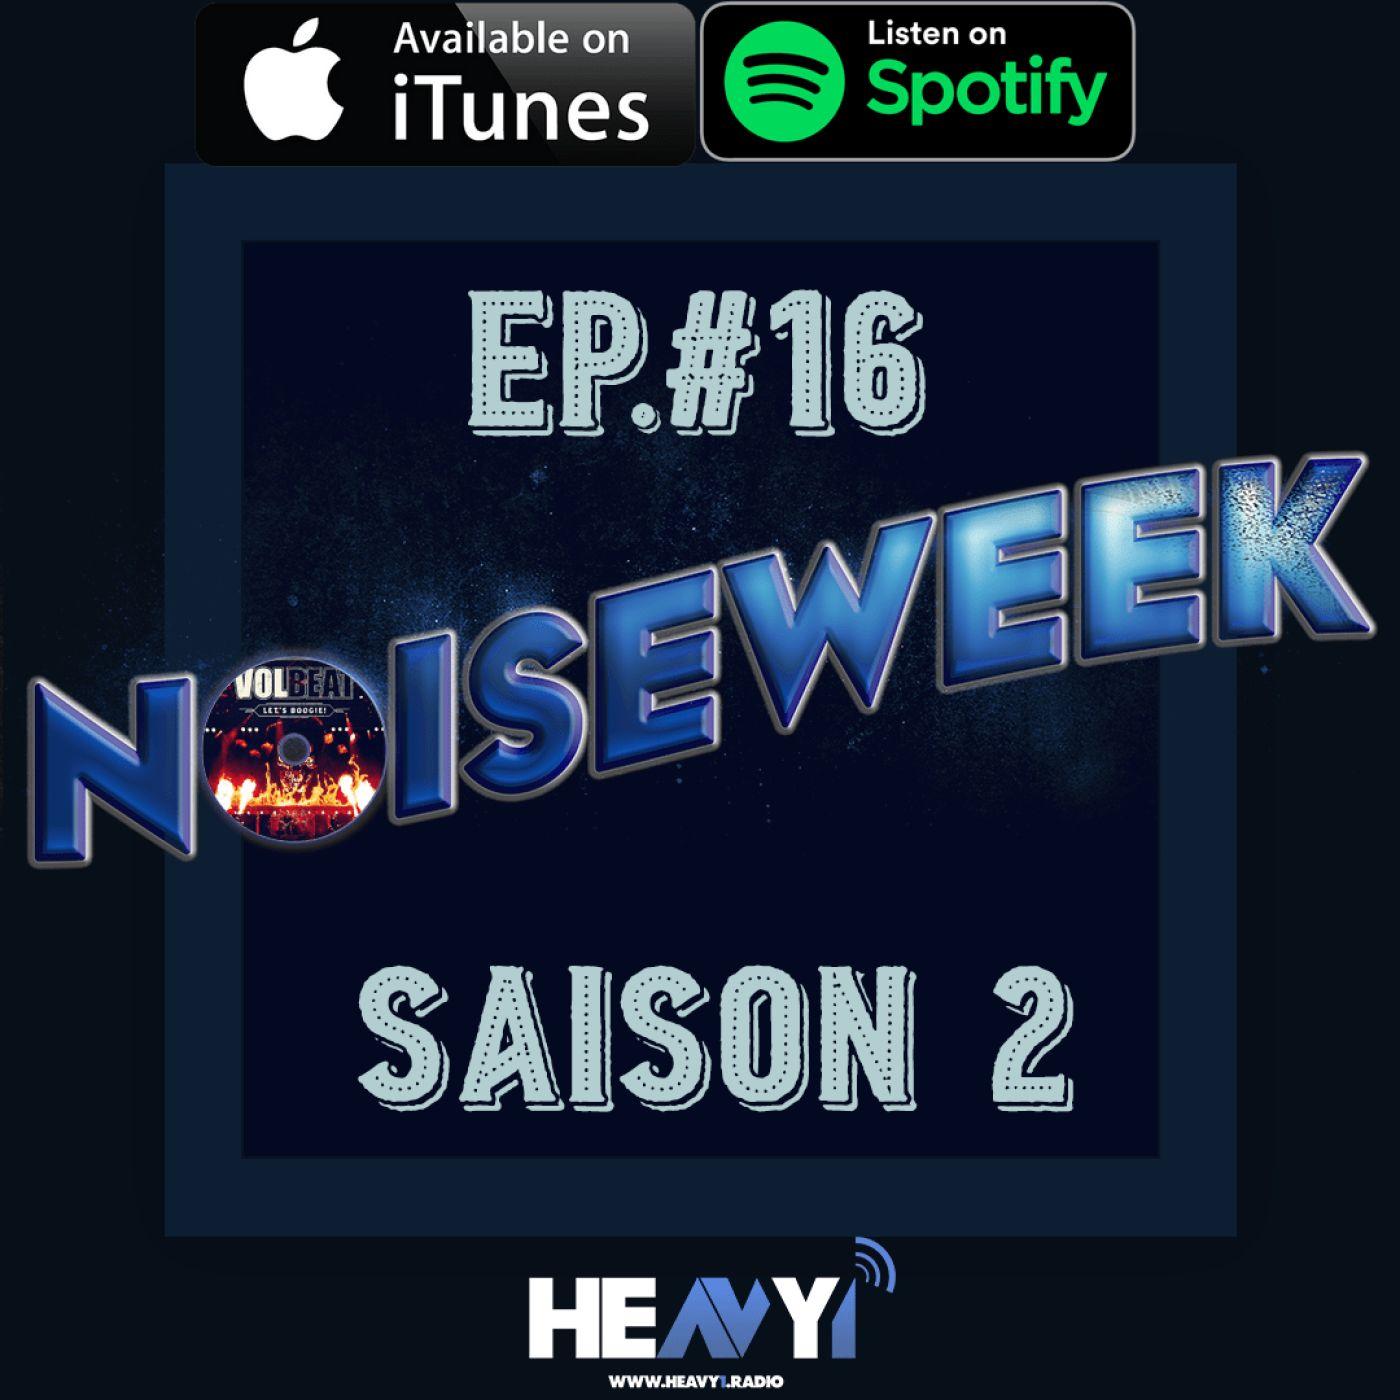 Noiseweek #16 Saison 2